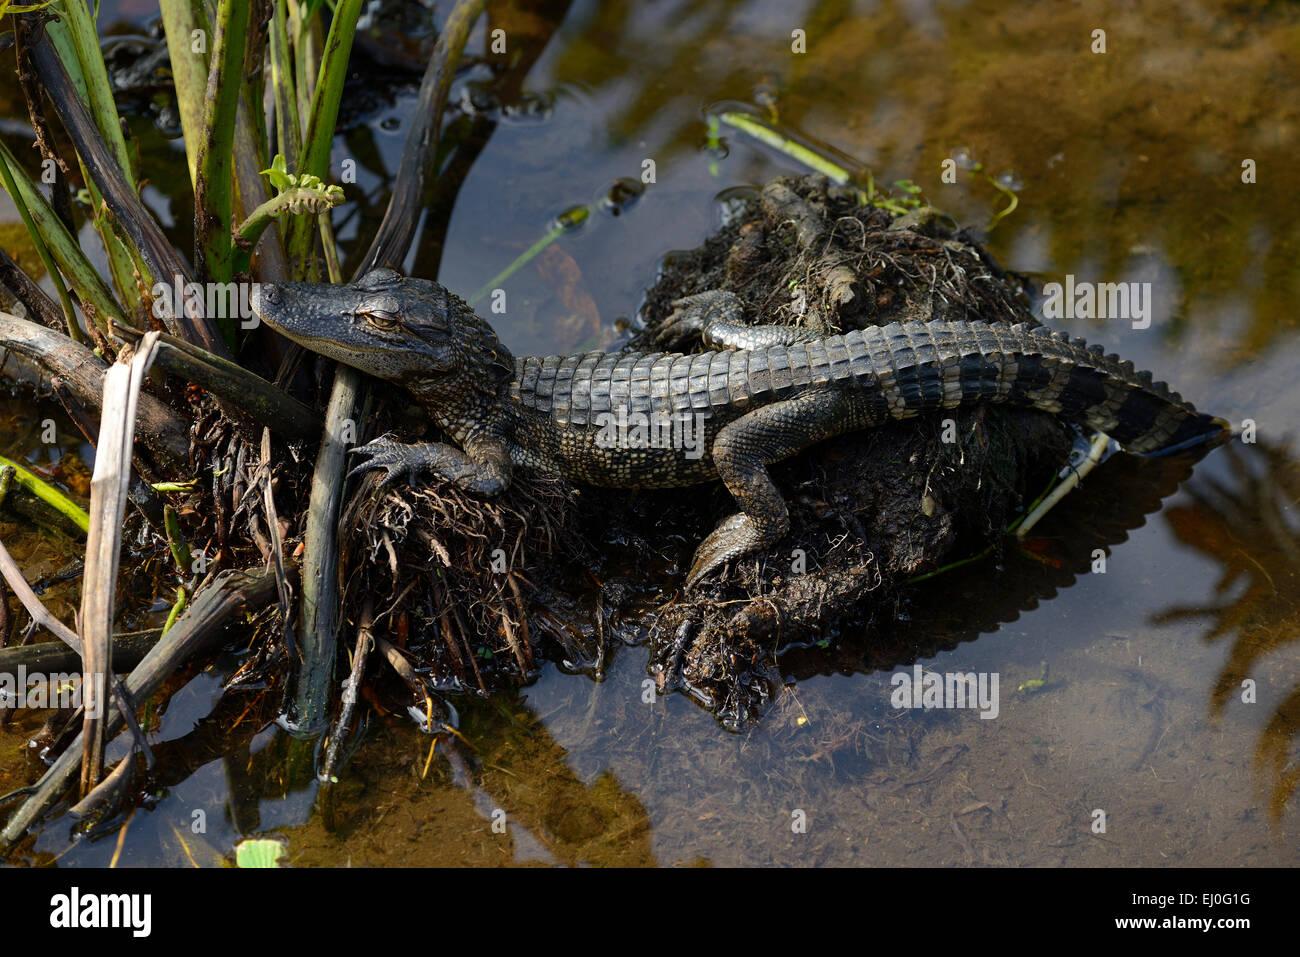 USA, Florida, Palm Beach County, Delray Beach, Wakodahatchee, Wetlands, Alligatoridae, young American alligator - Stock Image